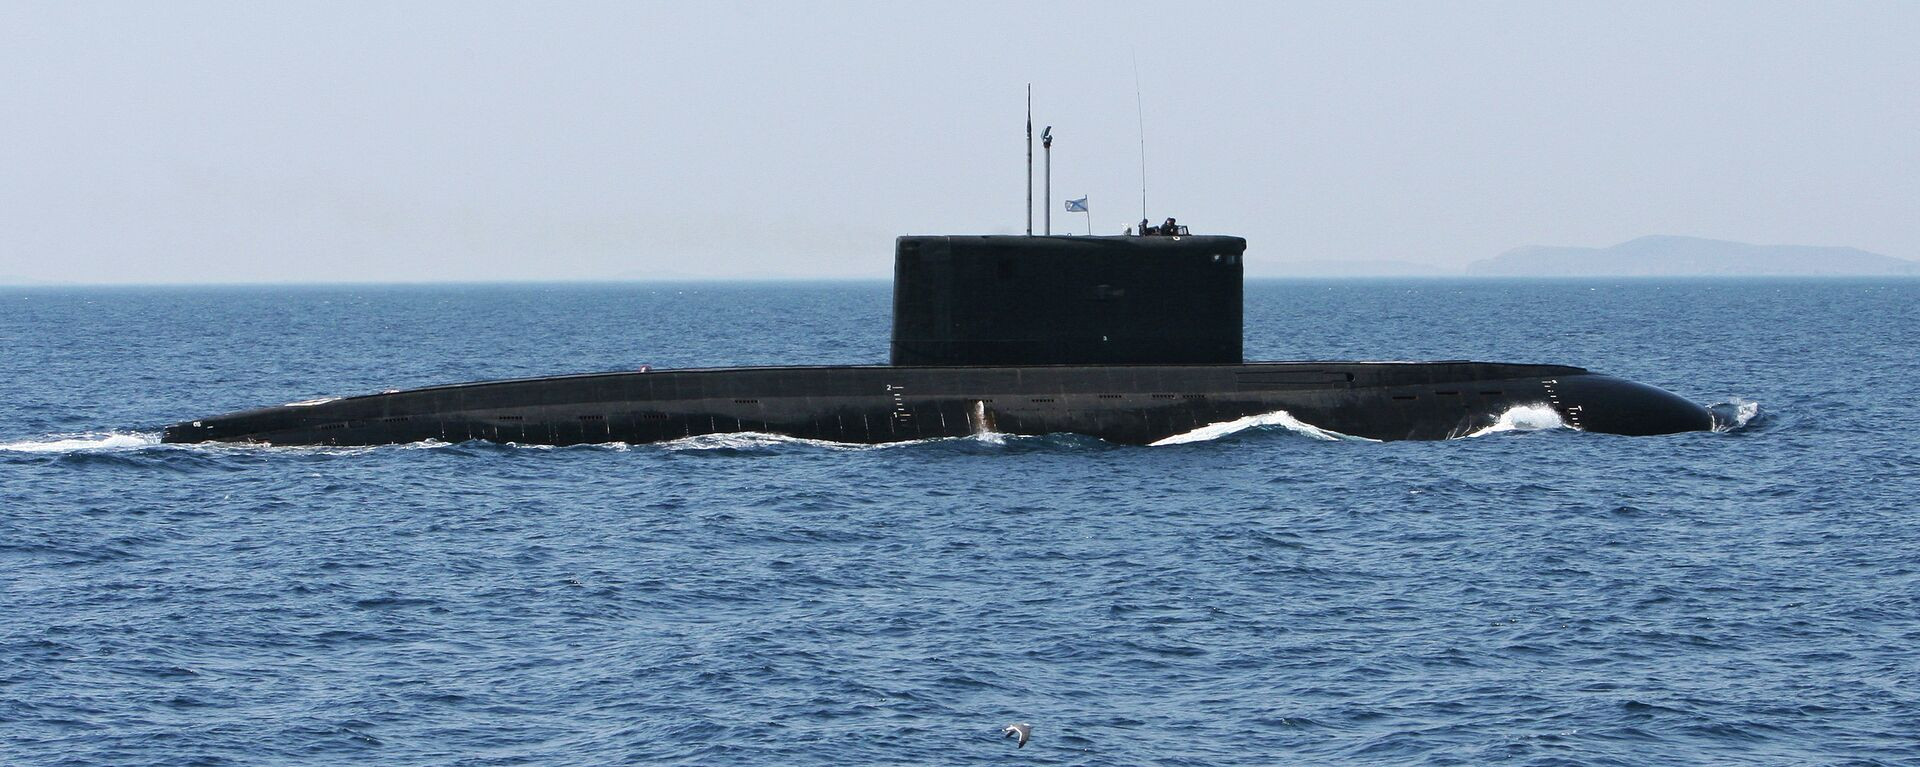 Submarino del proyecto 636.3 Varshavianka - Sputnik Mundo, 1920, 14.03.2021